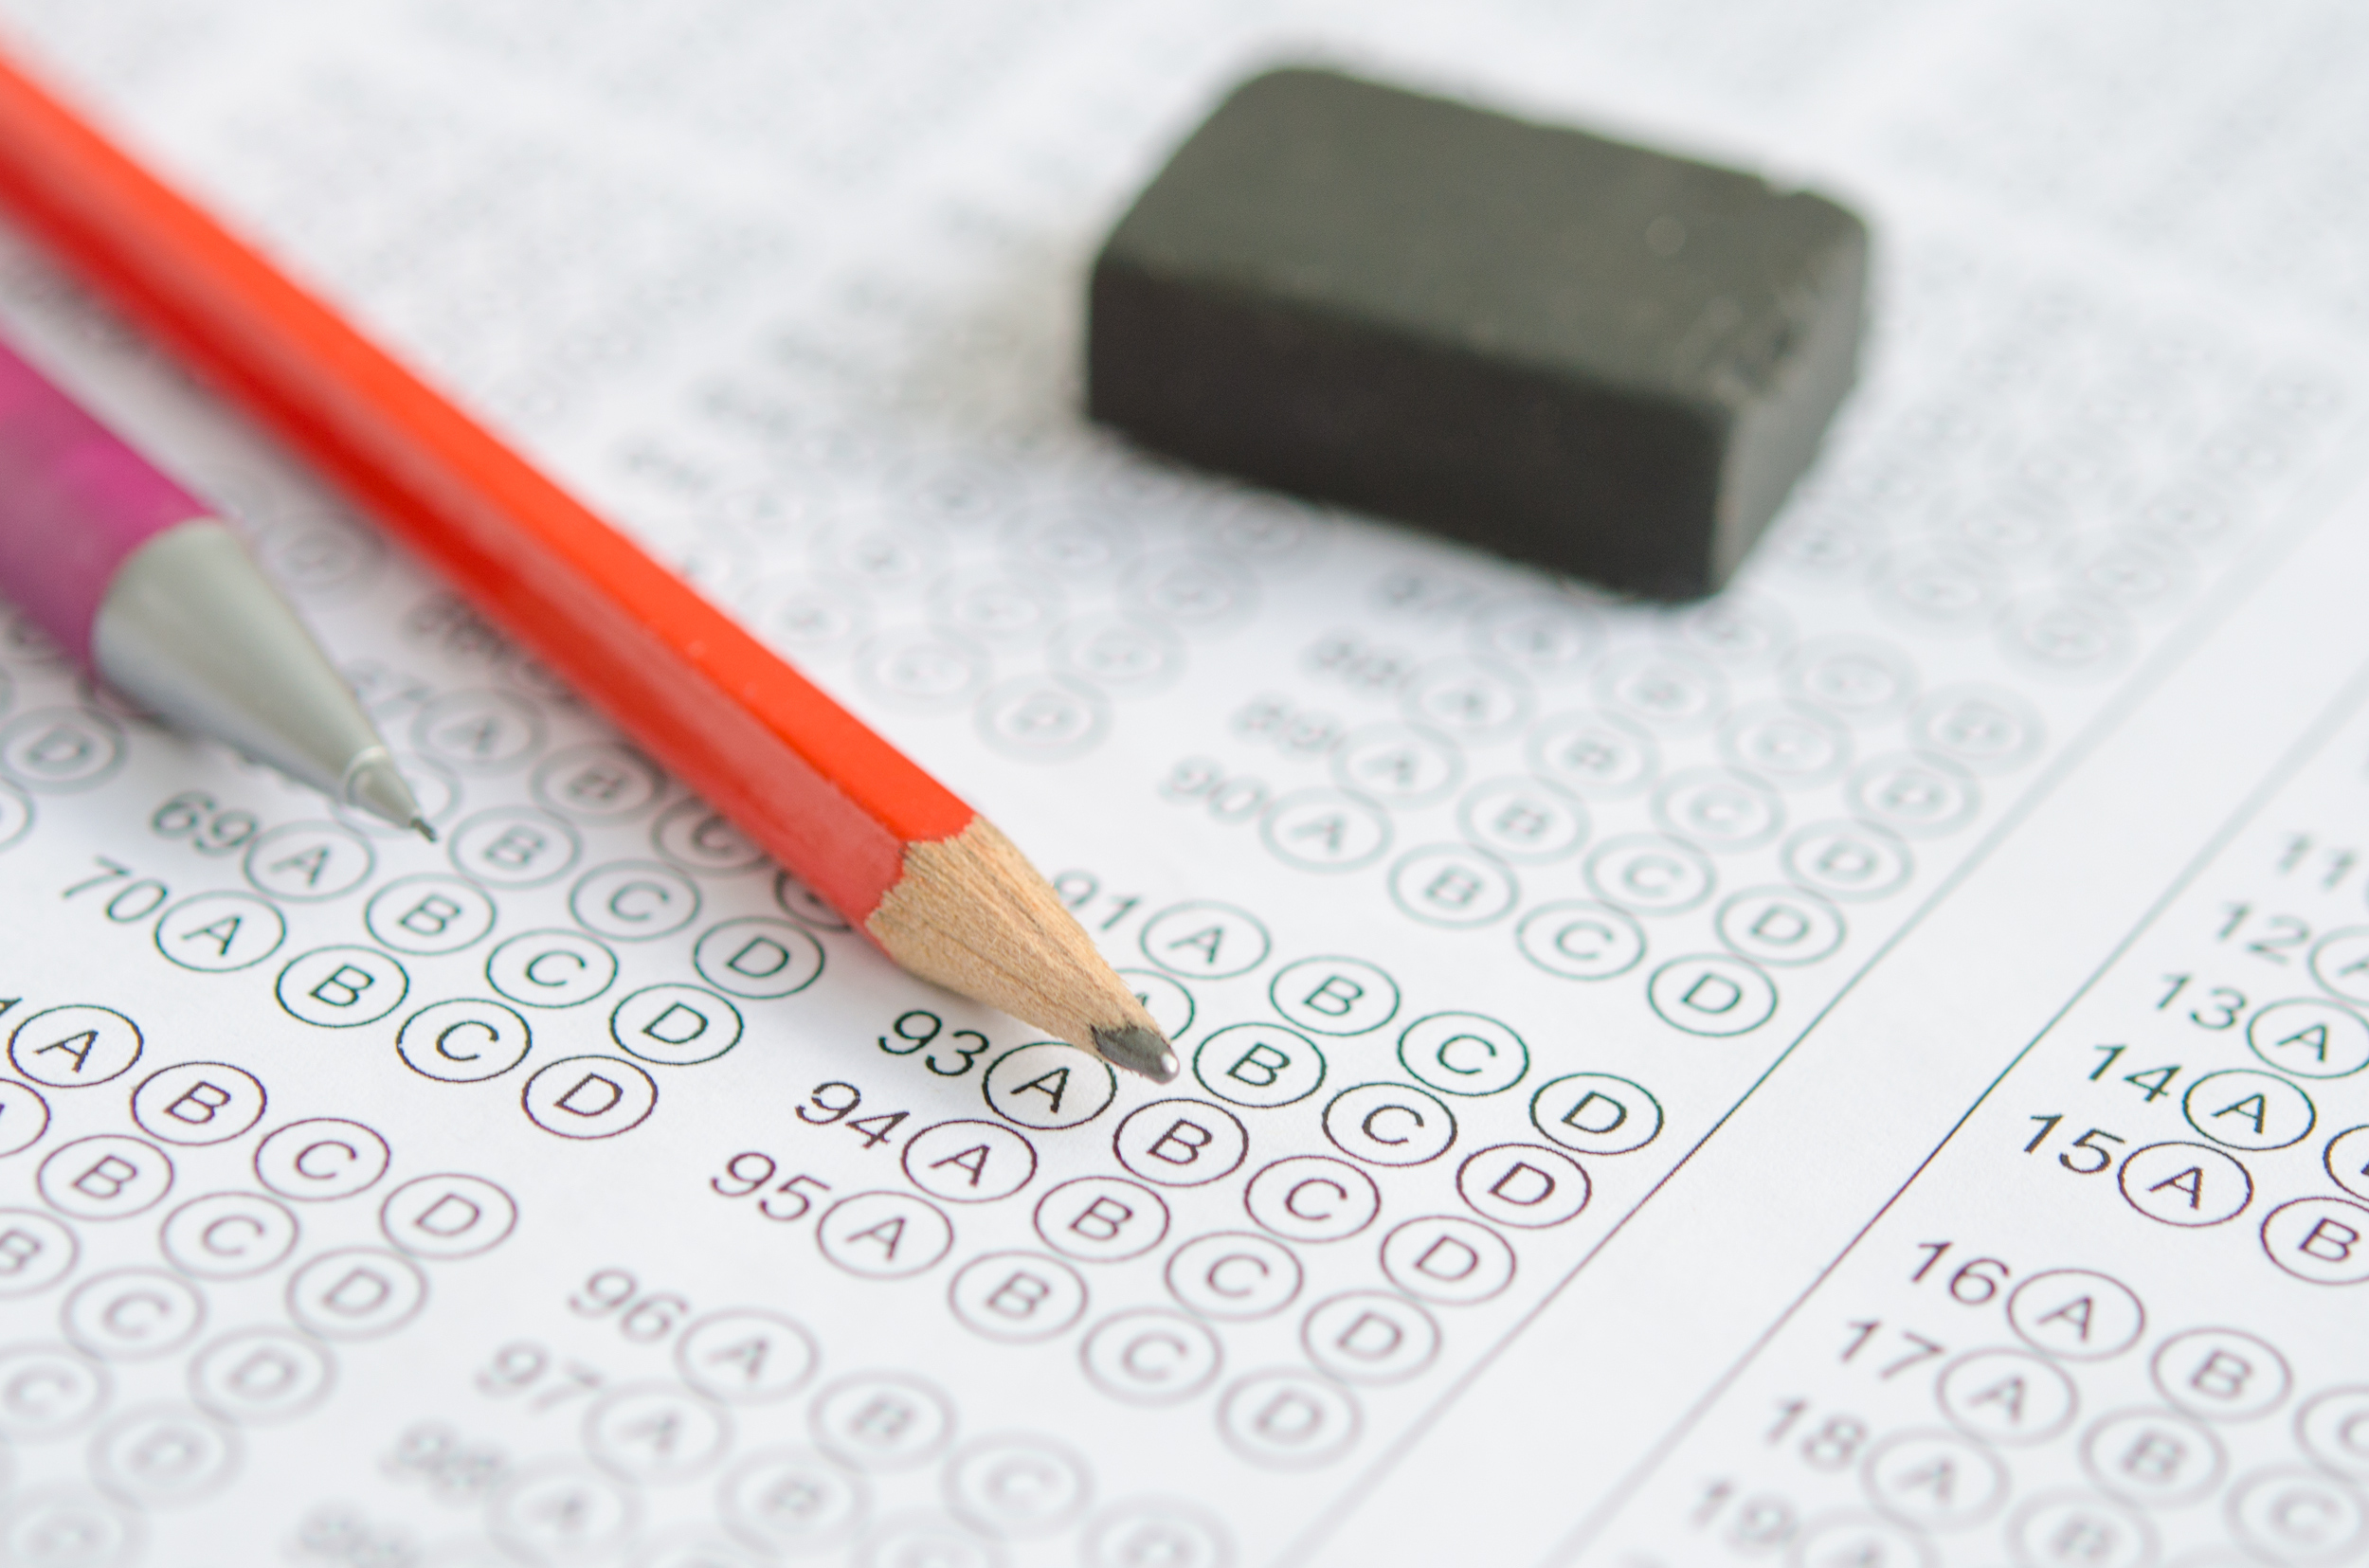 日本語能力試驗合格策略~只要一天就能做到,超級有效的考試準備方法!?/~ 日本語能力試験合格戦略~1日でできる効果絶大の試験準備とは?~